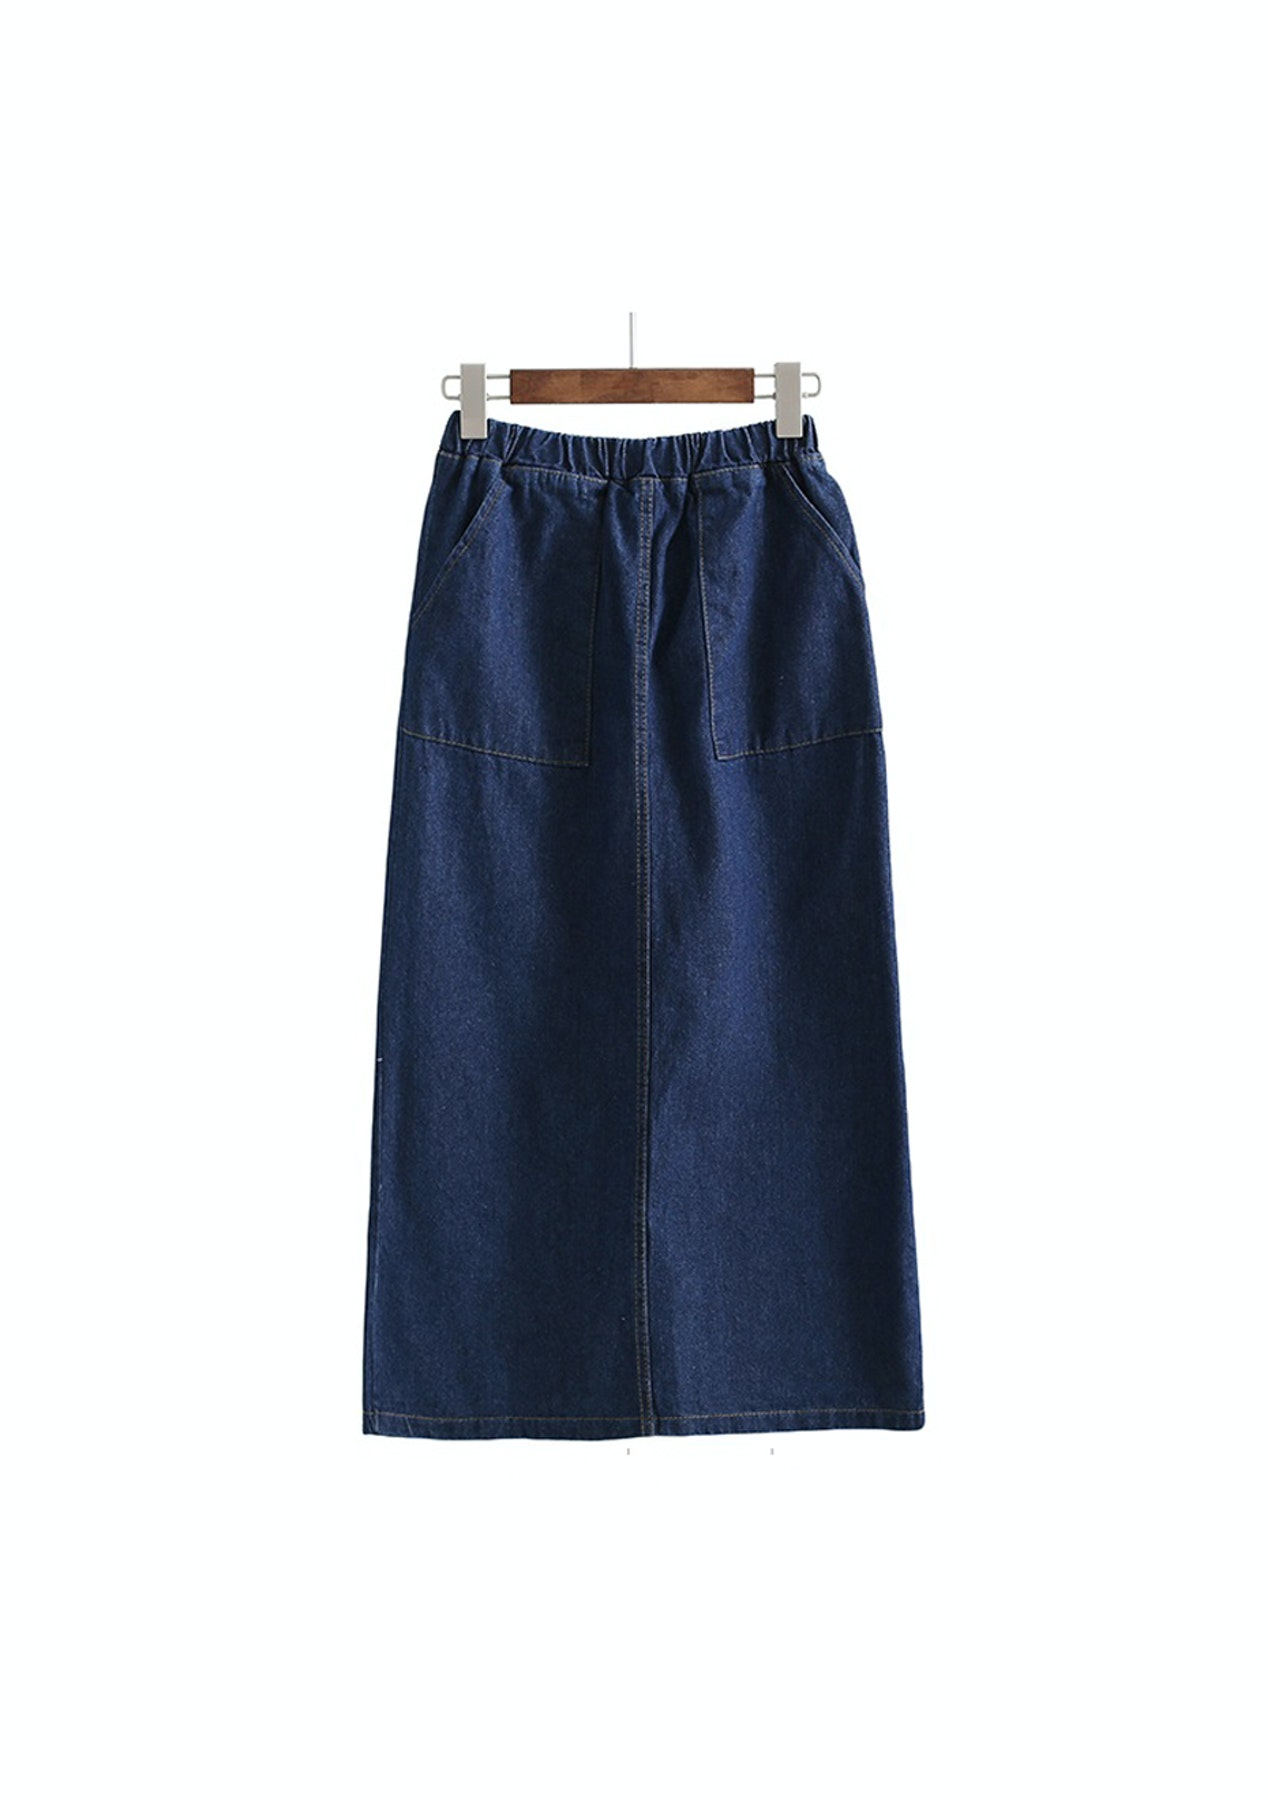 1eaf2ac5d83b9 Lulu Denim Pencil Skirt - Dark Blue - Garage Sale Womens - Onceit